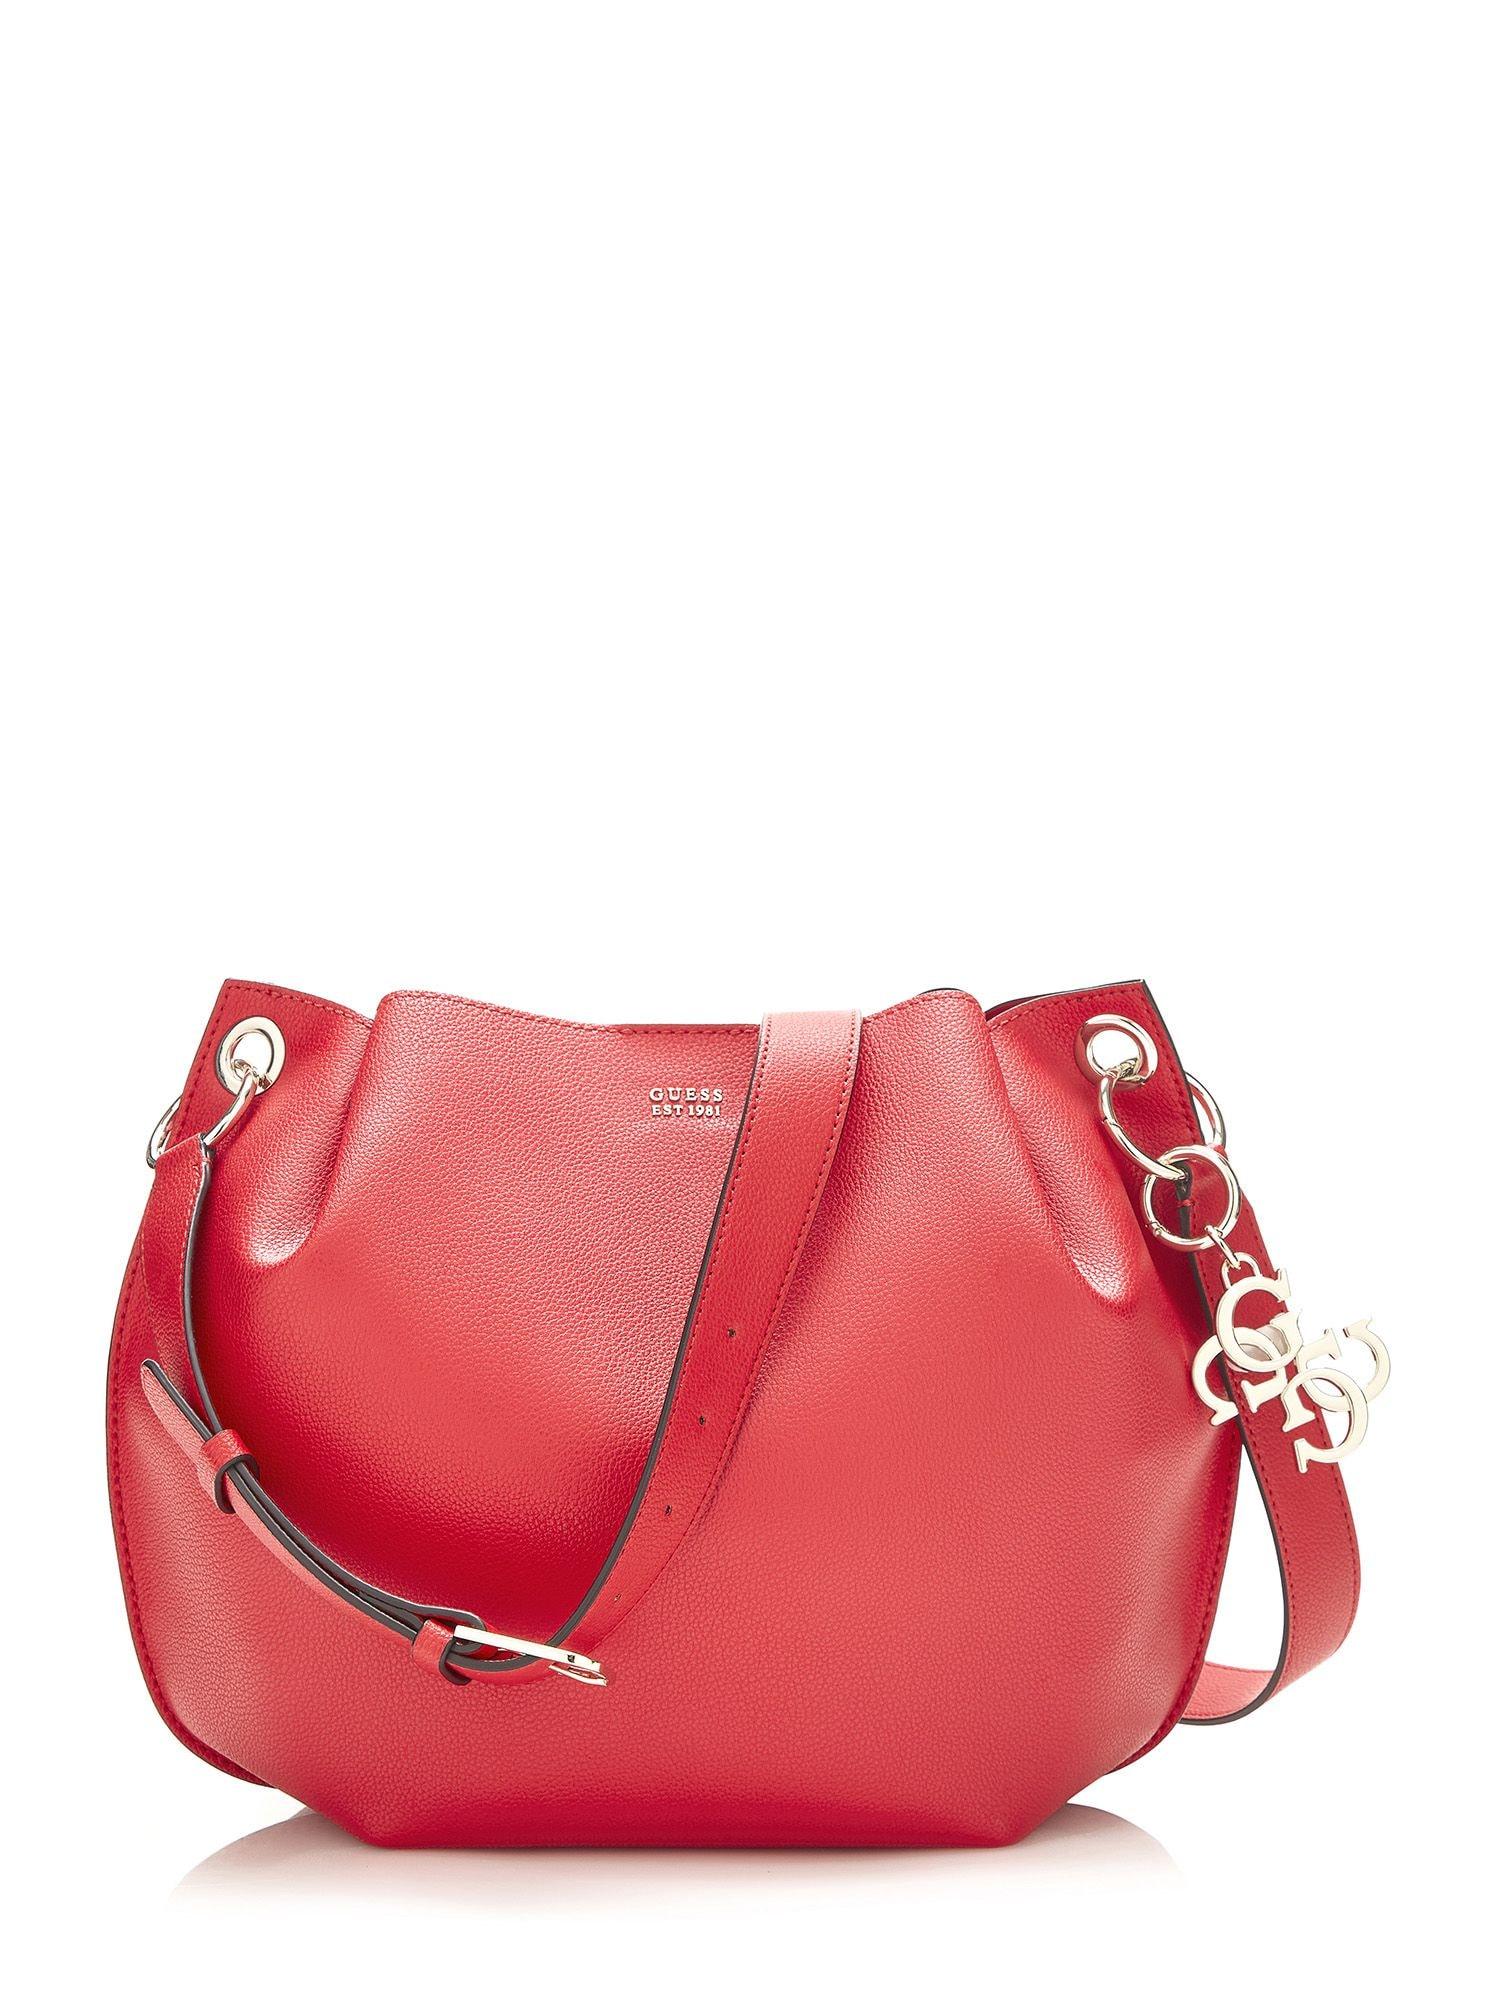 Beuteltasche 'Digital'   Taschen > Handtaschen > Beuteltaschen   Guess